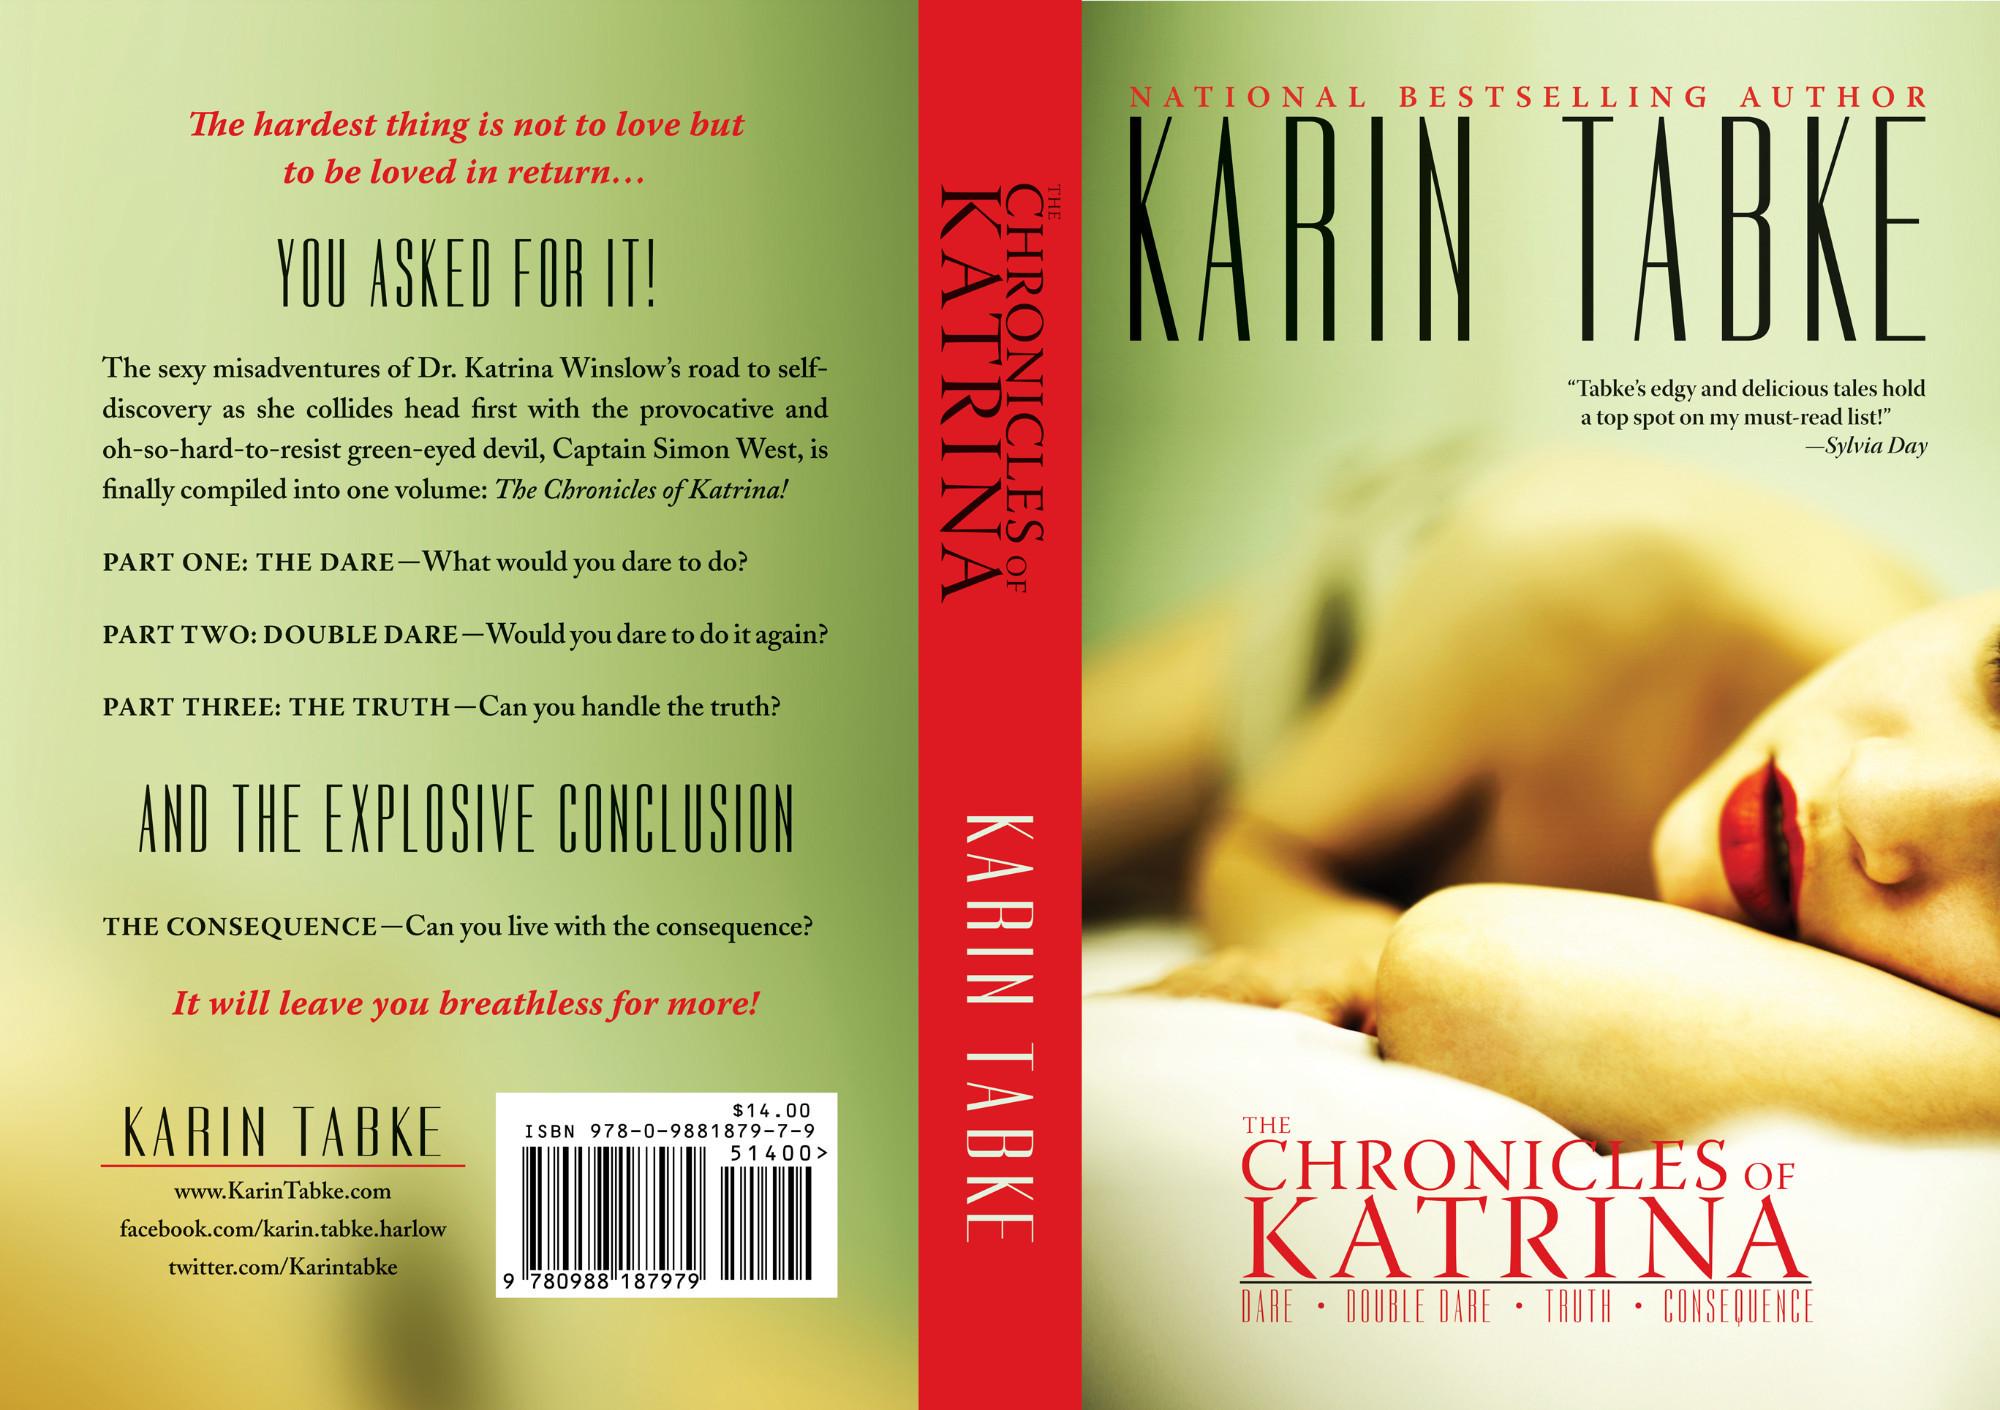 9780988187979_KarinTabke_TCK_CreateSpace_CoverSpread_4814_563-131.jpg